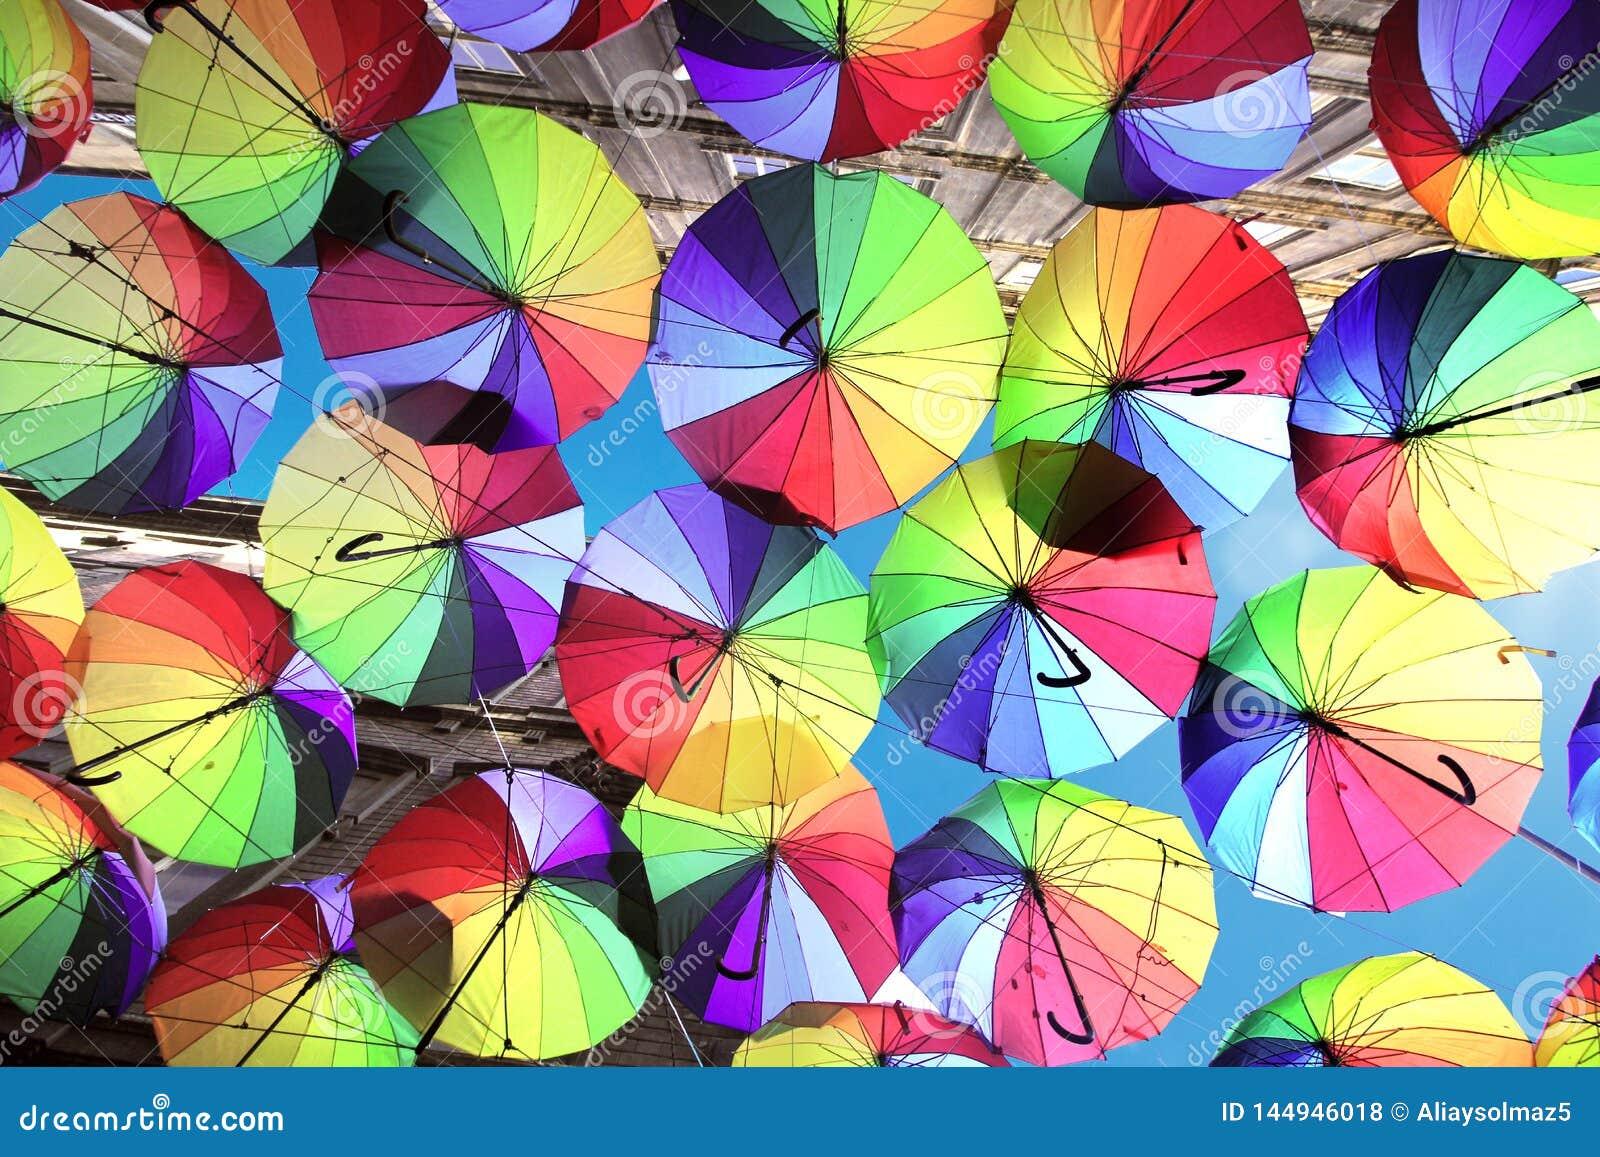 Istambul, Karakoy/Turquia - 04 04 2019: Os guarda-chuvas coloridos decoraram a parte superior da rua de Karakoy na Istambul, deco